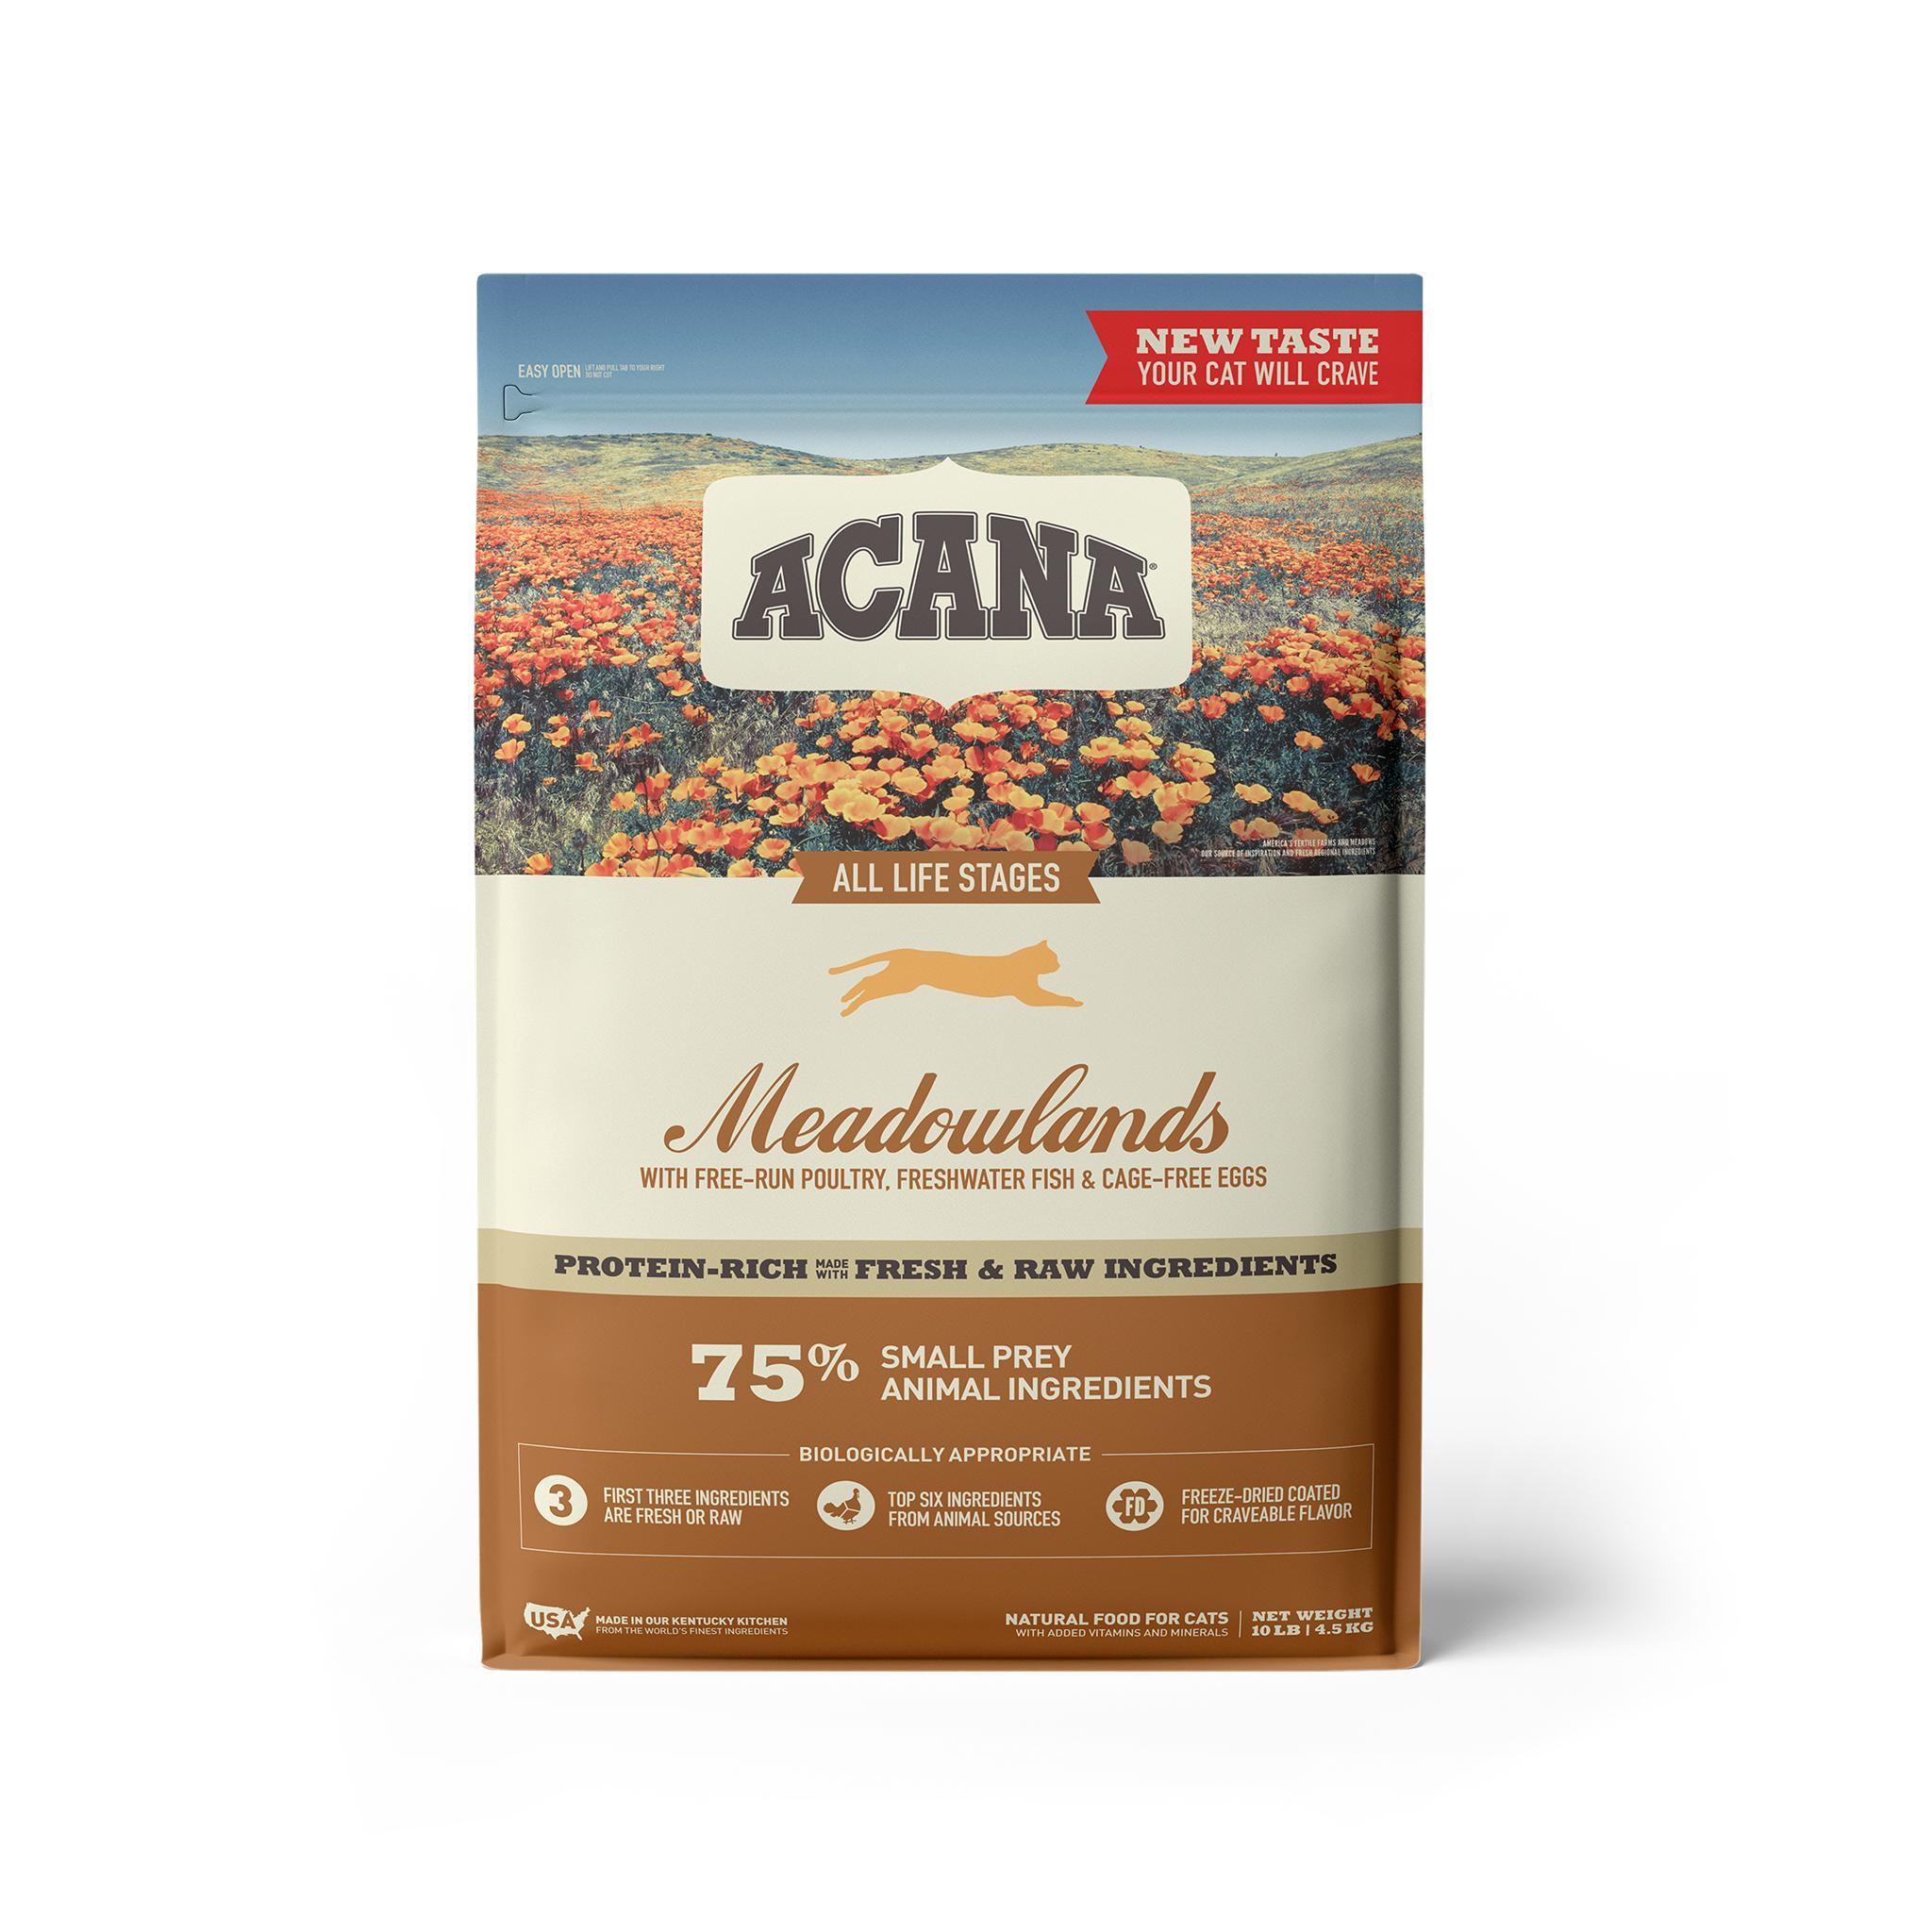 ACANA Meadowlands Grain-Free Dry Cat Food, 10-lb bag